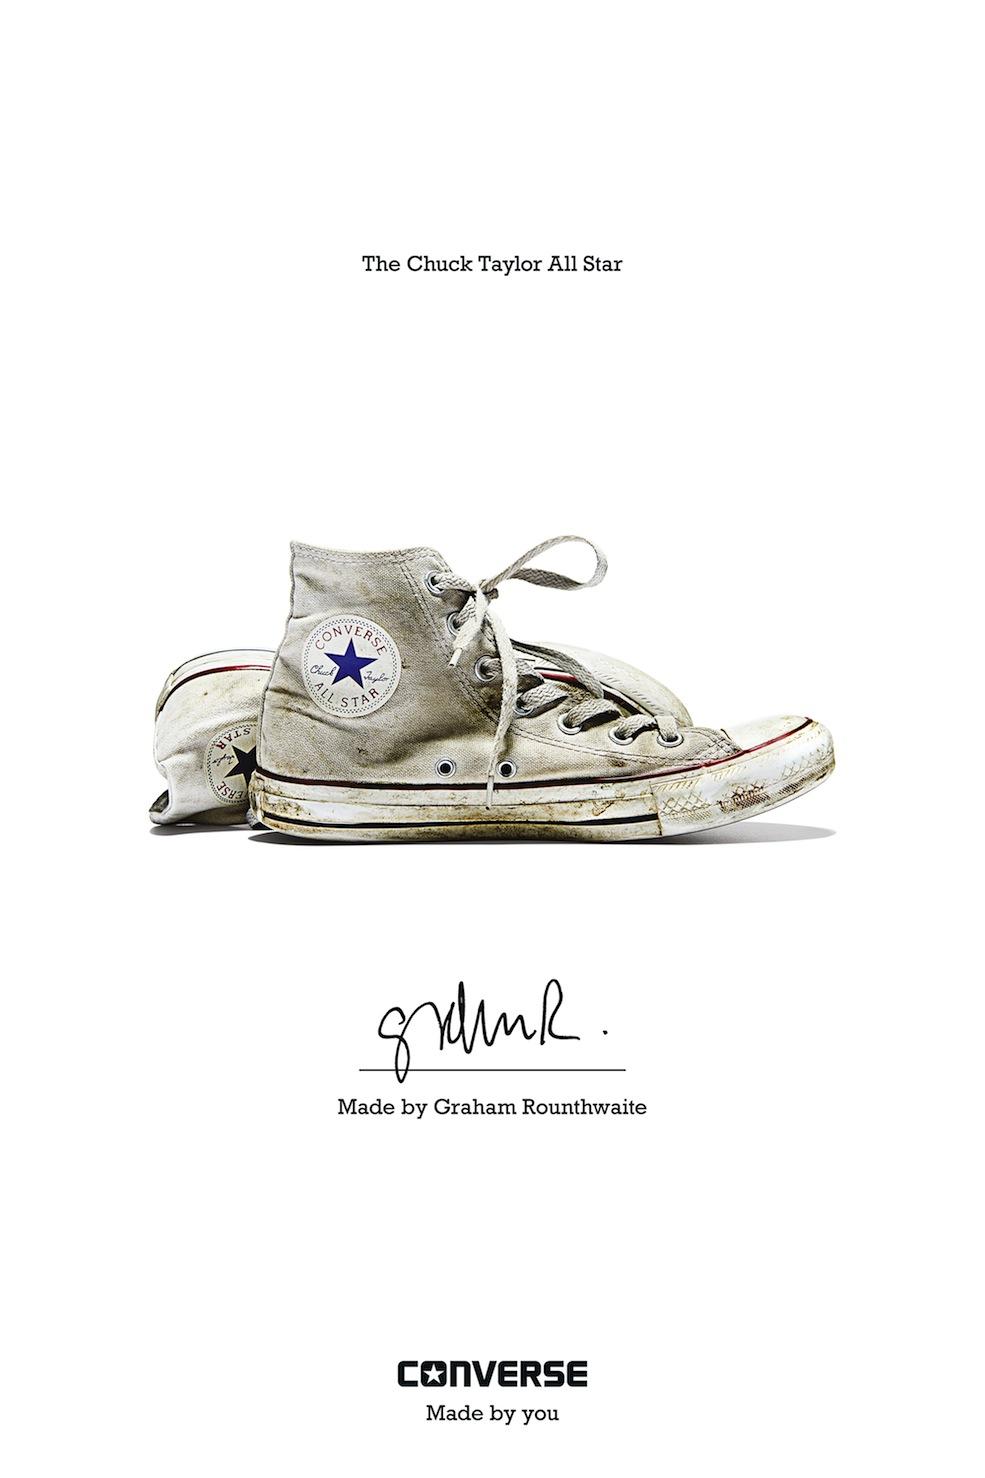 Graham Rounthwaite - Converse Sneaker Portrait